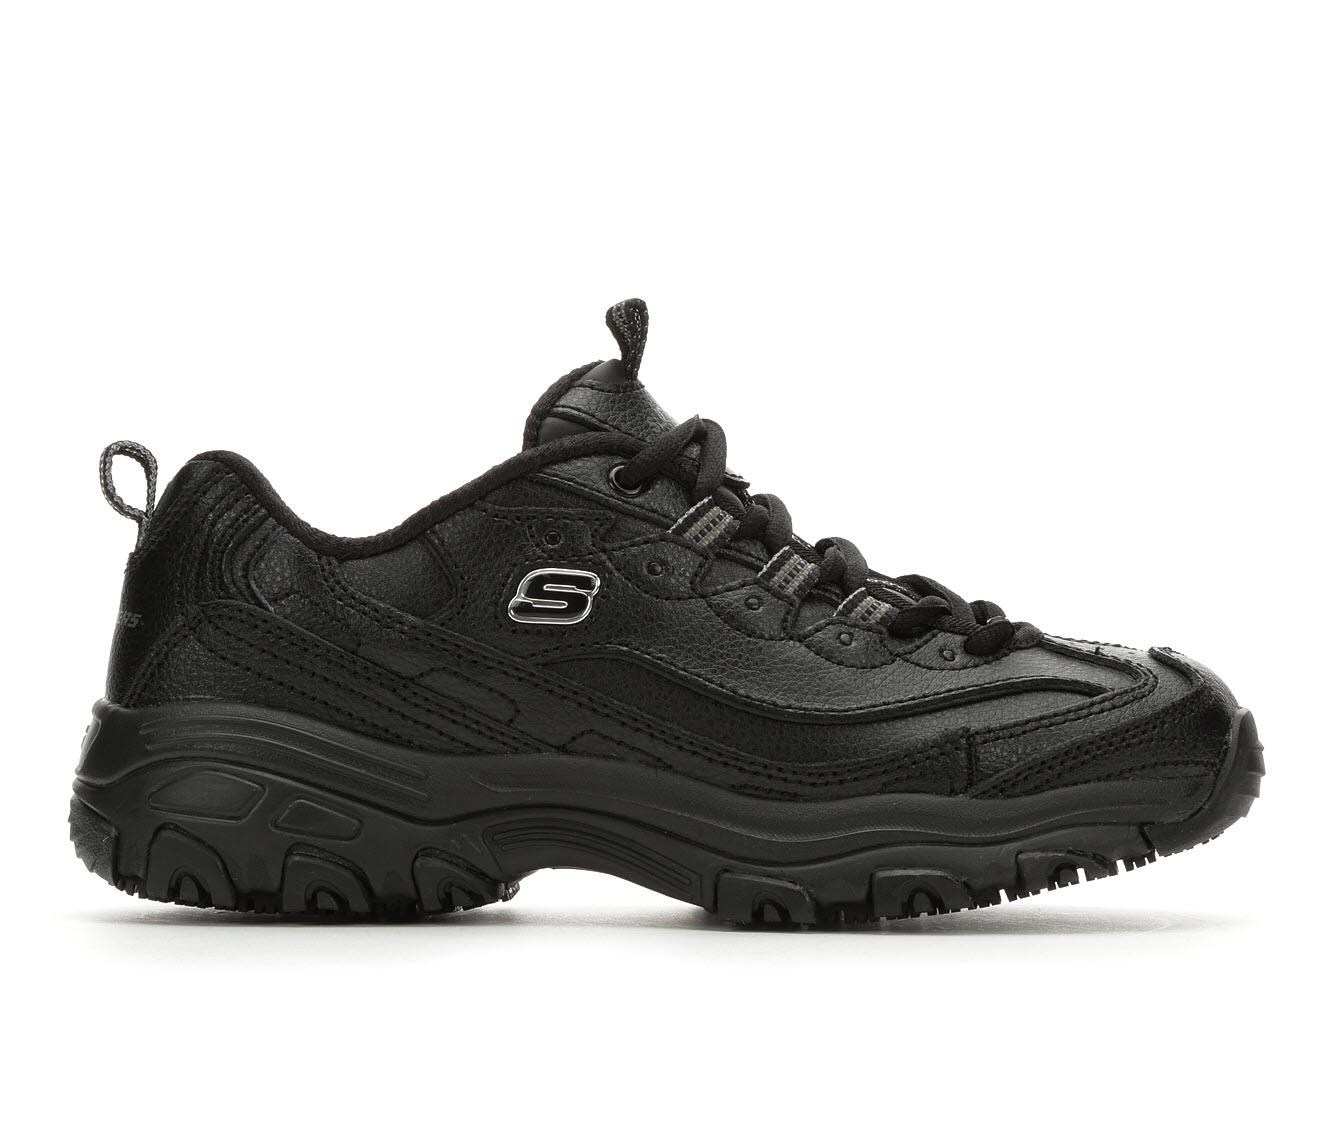 Skechers Work Marbleton 76605 Men's Boot (Black Leather)